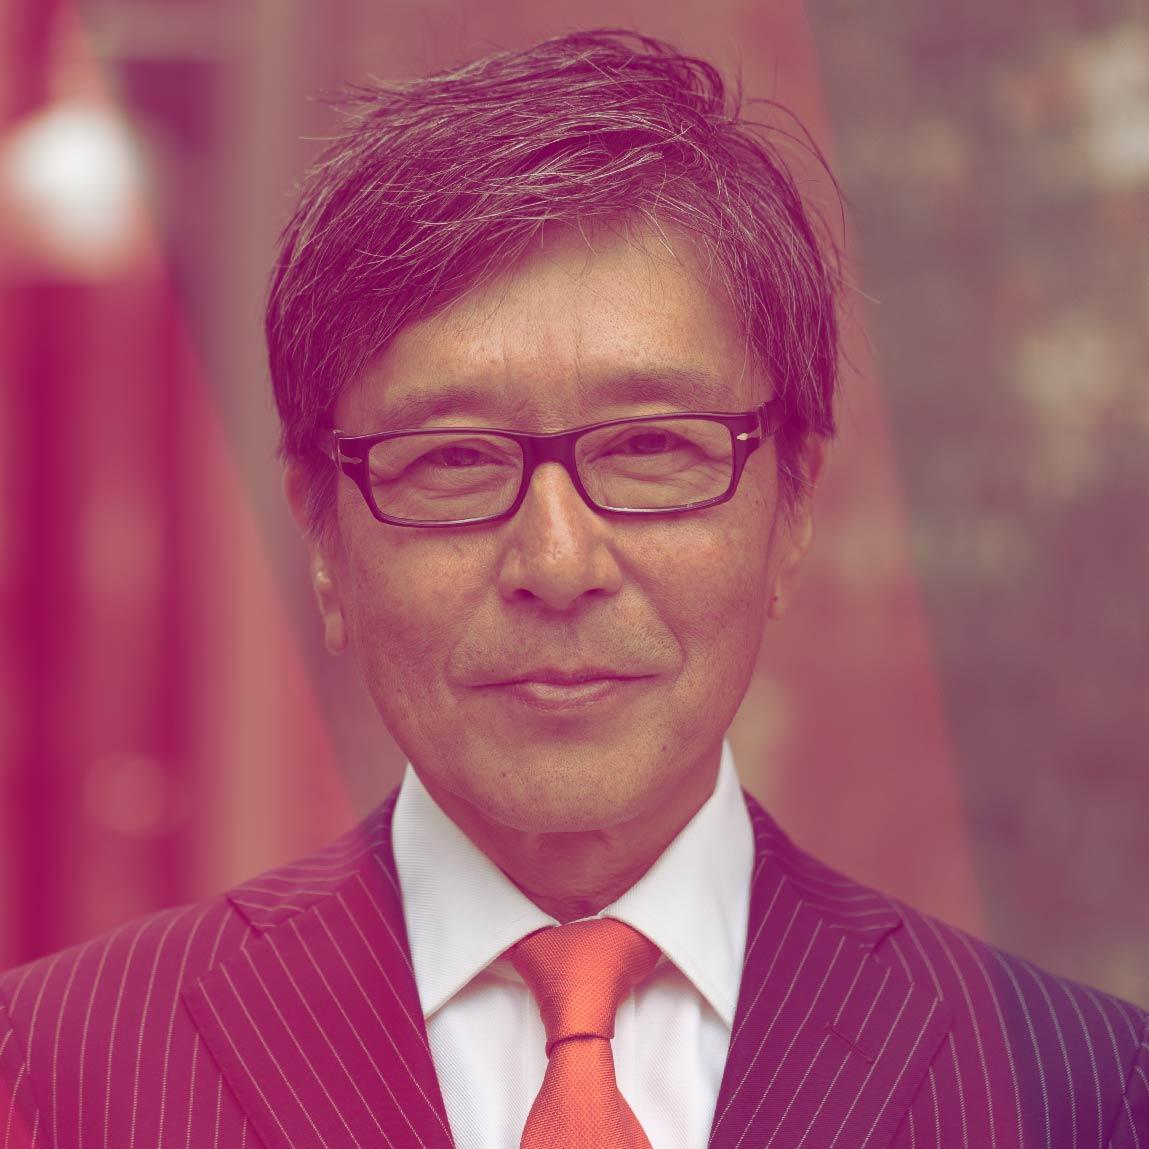 FG Portraits - Mature Asian Man in Suit.jpg